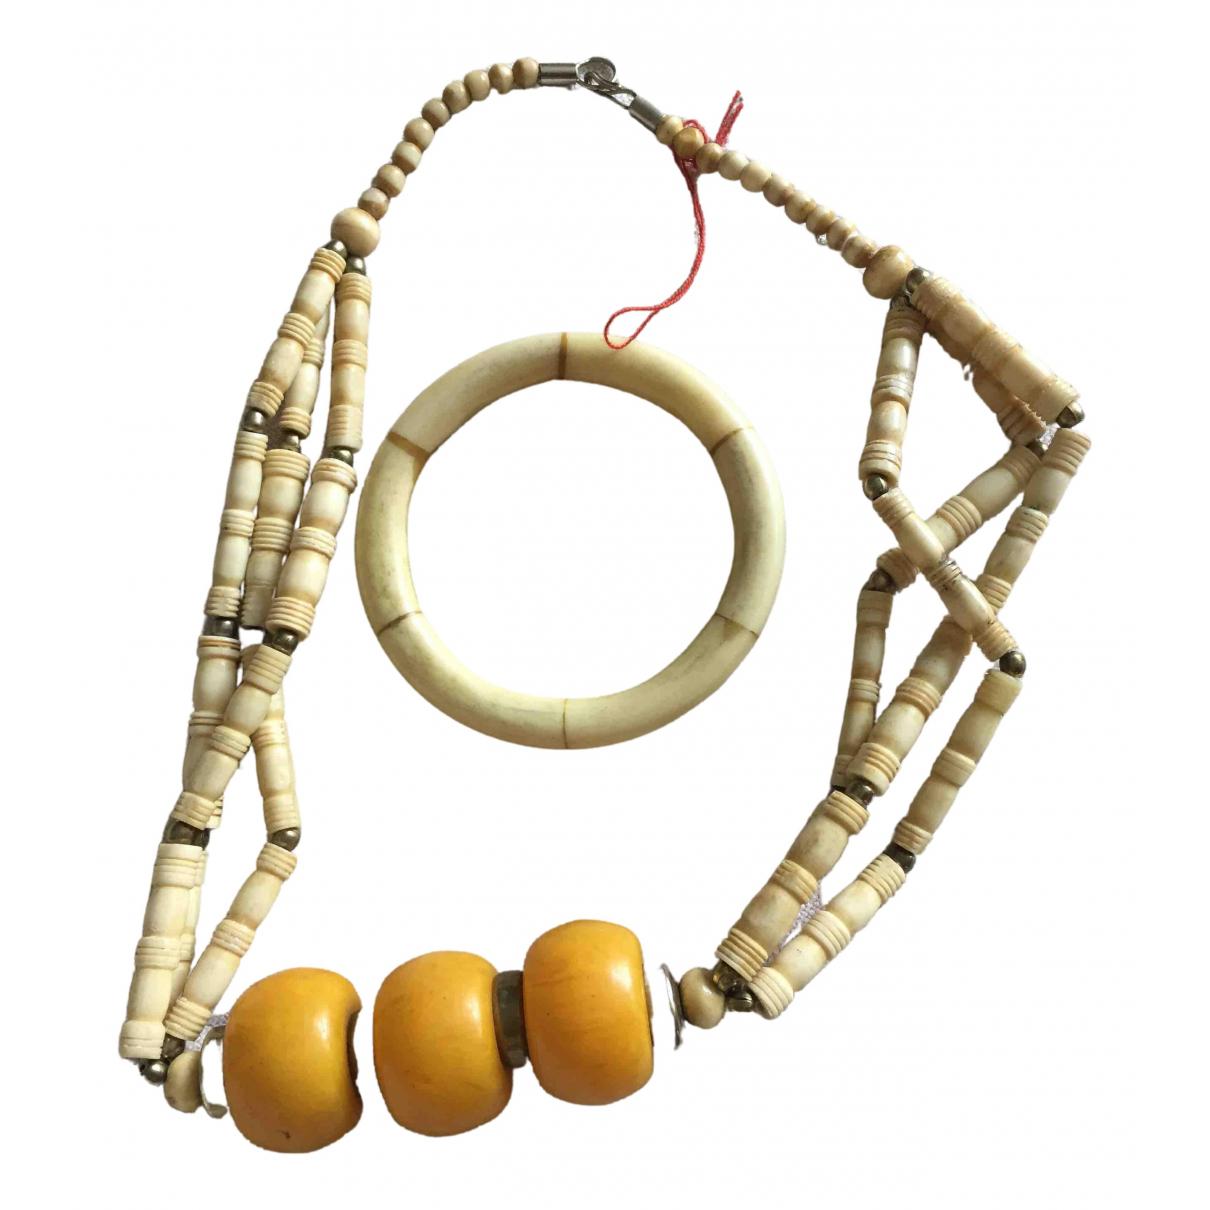 Collar Motifs Ethniques de Cuerno Non Signe / Unsigned